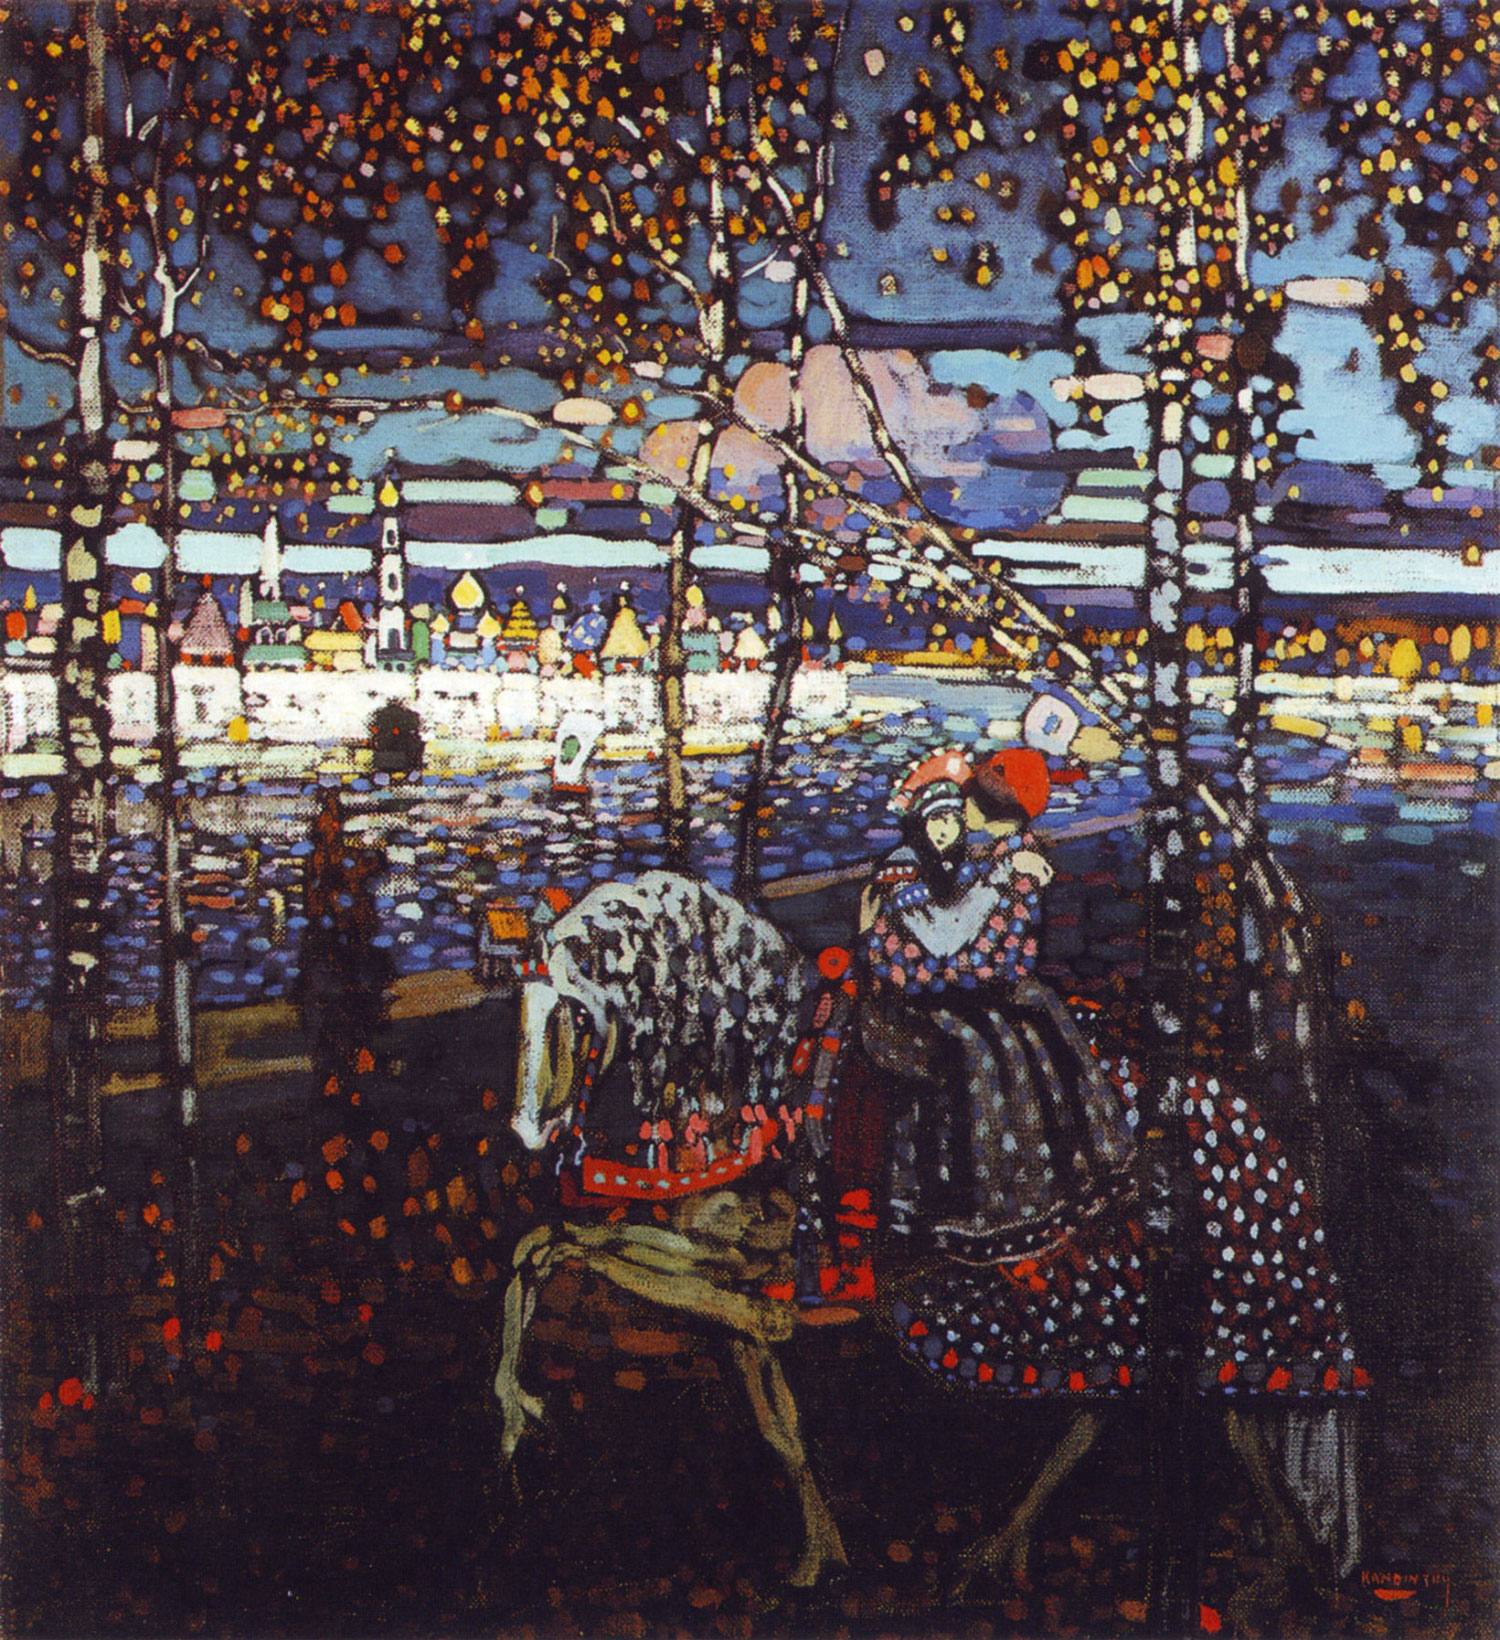 Wassily Kandinsky: Coppia a cavallo (1906) • Olio su tela • cm 55 x 50,5 • Stadtische Galerie im Lenbachhaus (Monaco, Germania)